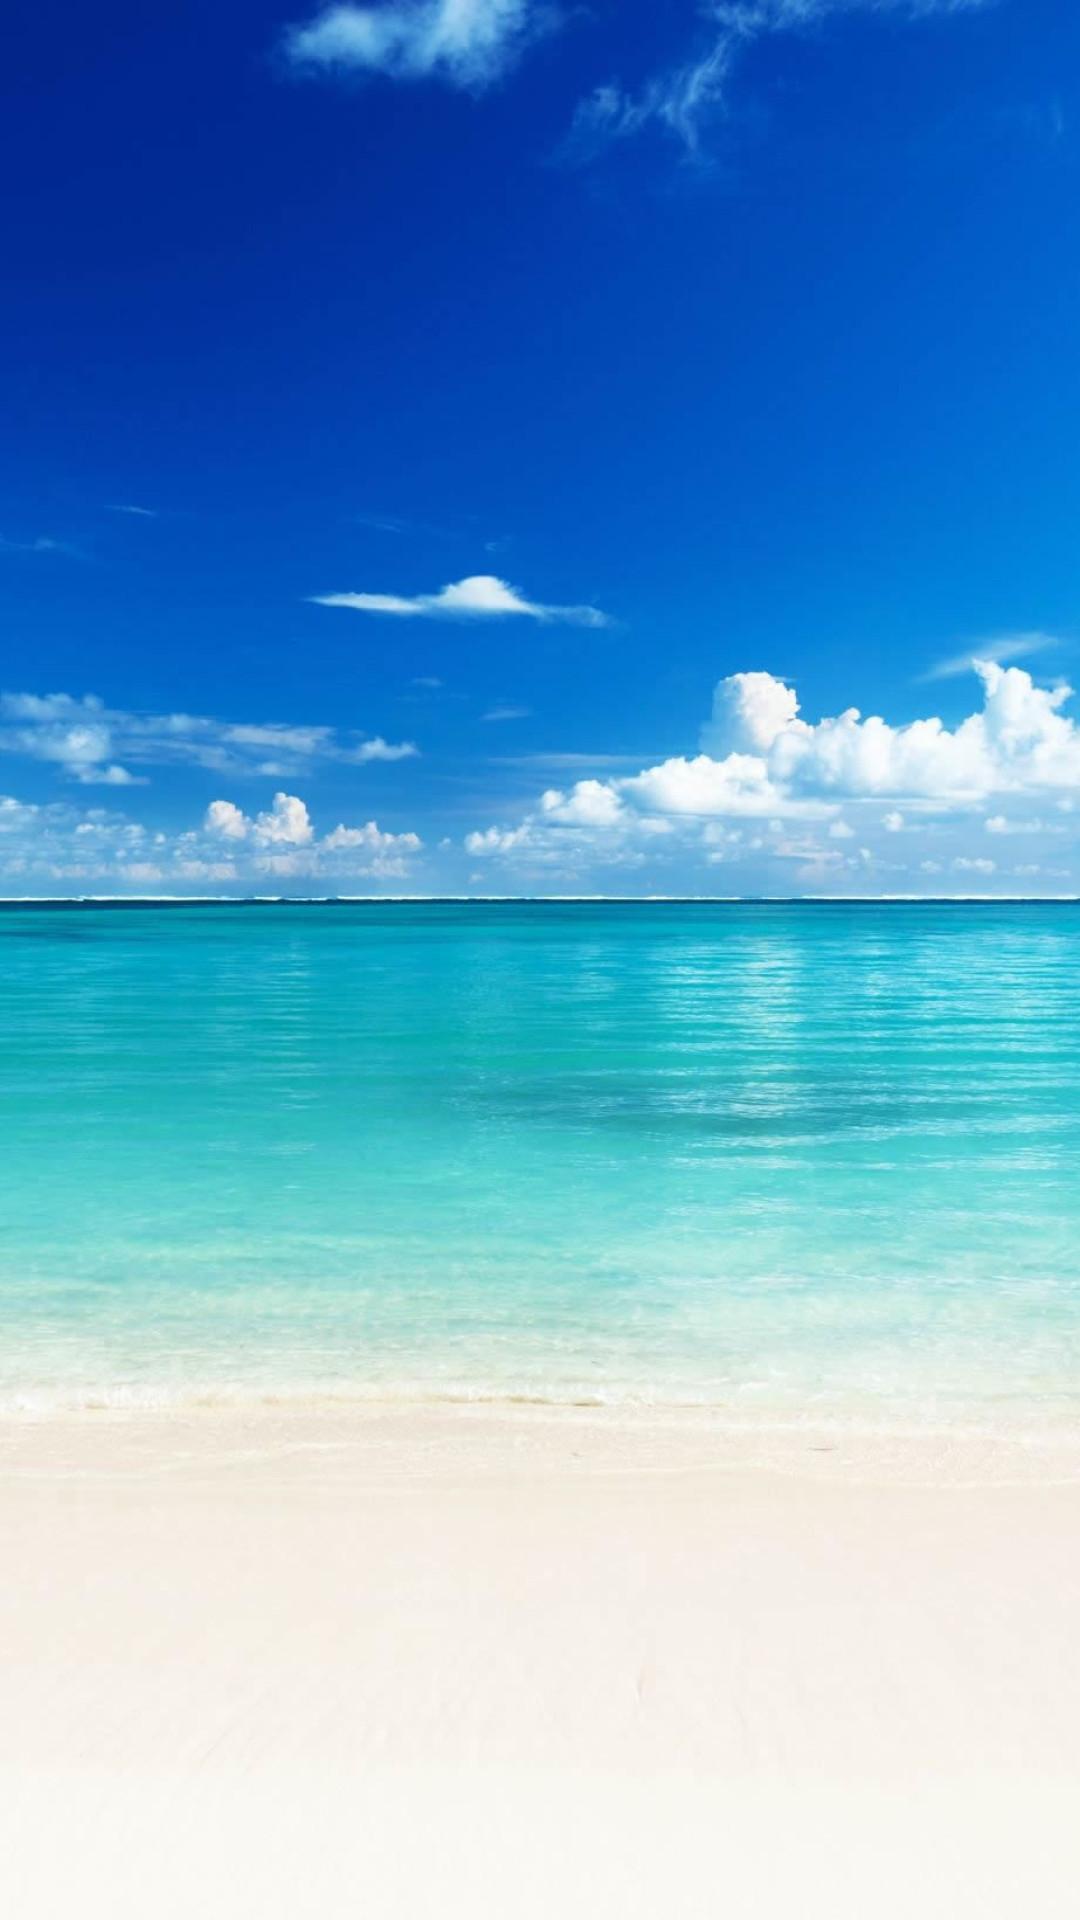 Hd Supreme Wallpaper Iphone X 【人気82位】透明感あるビーチ Iphonex スマホ壁紙 待受画像ギャラリー